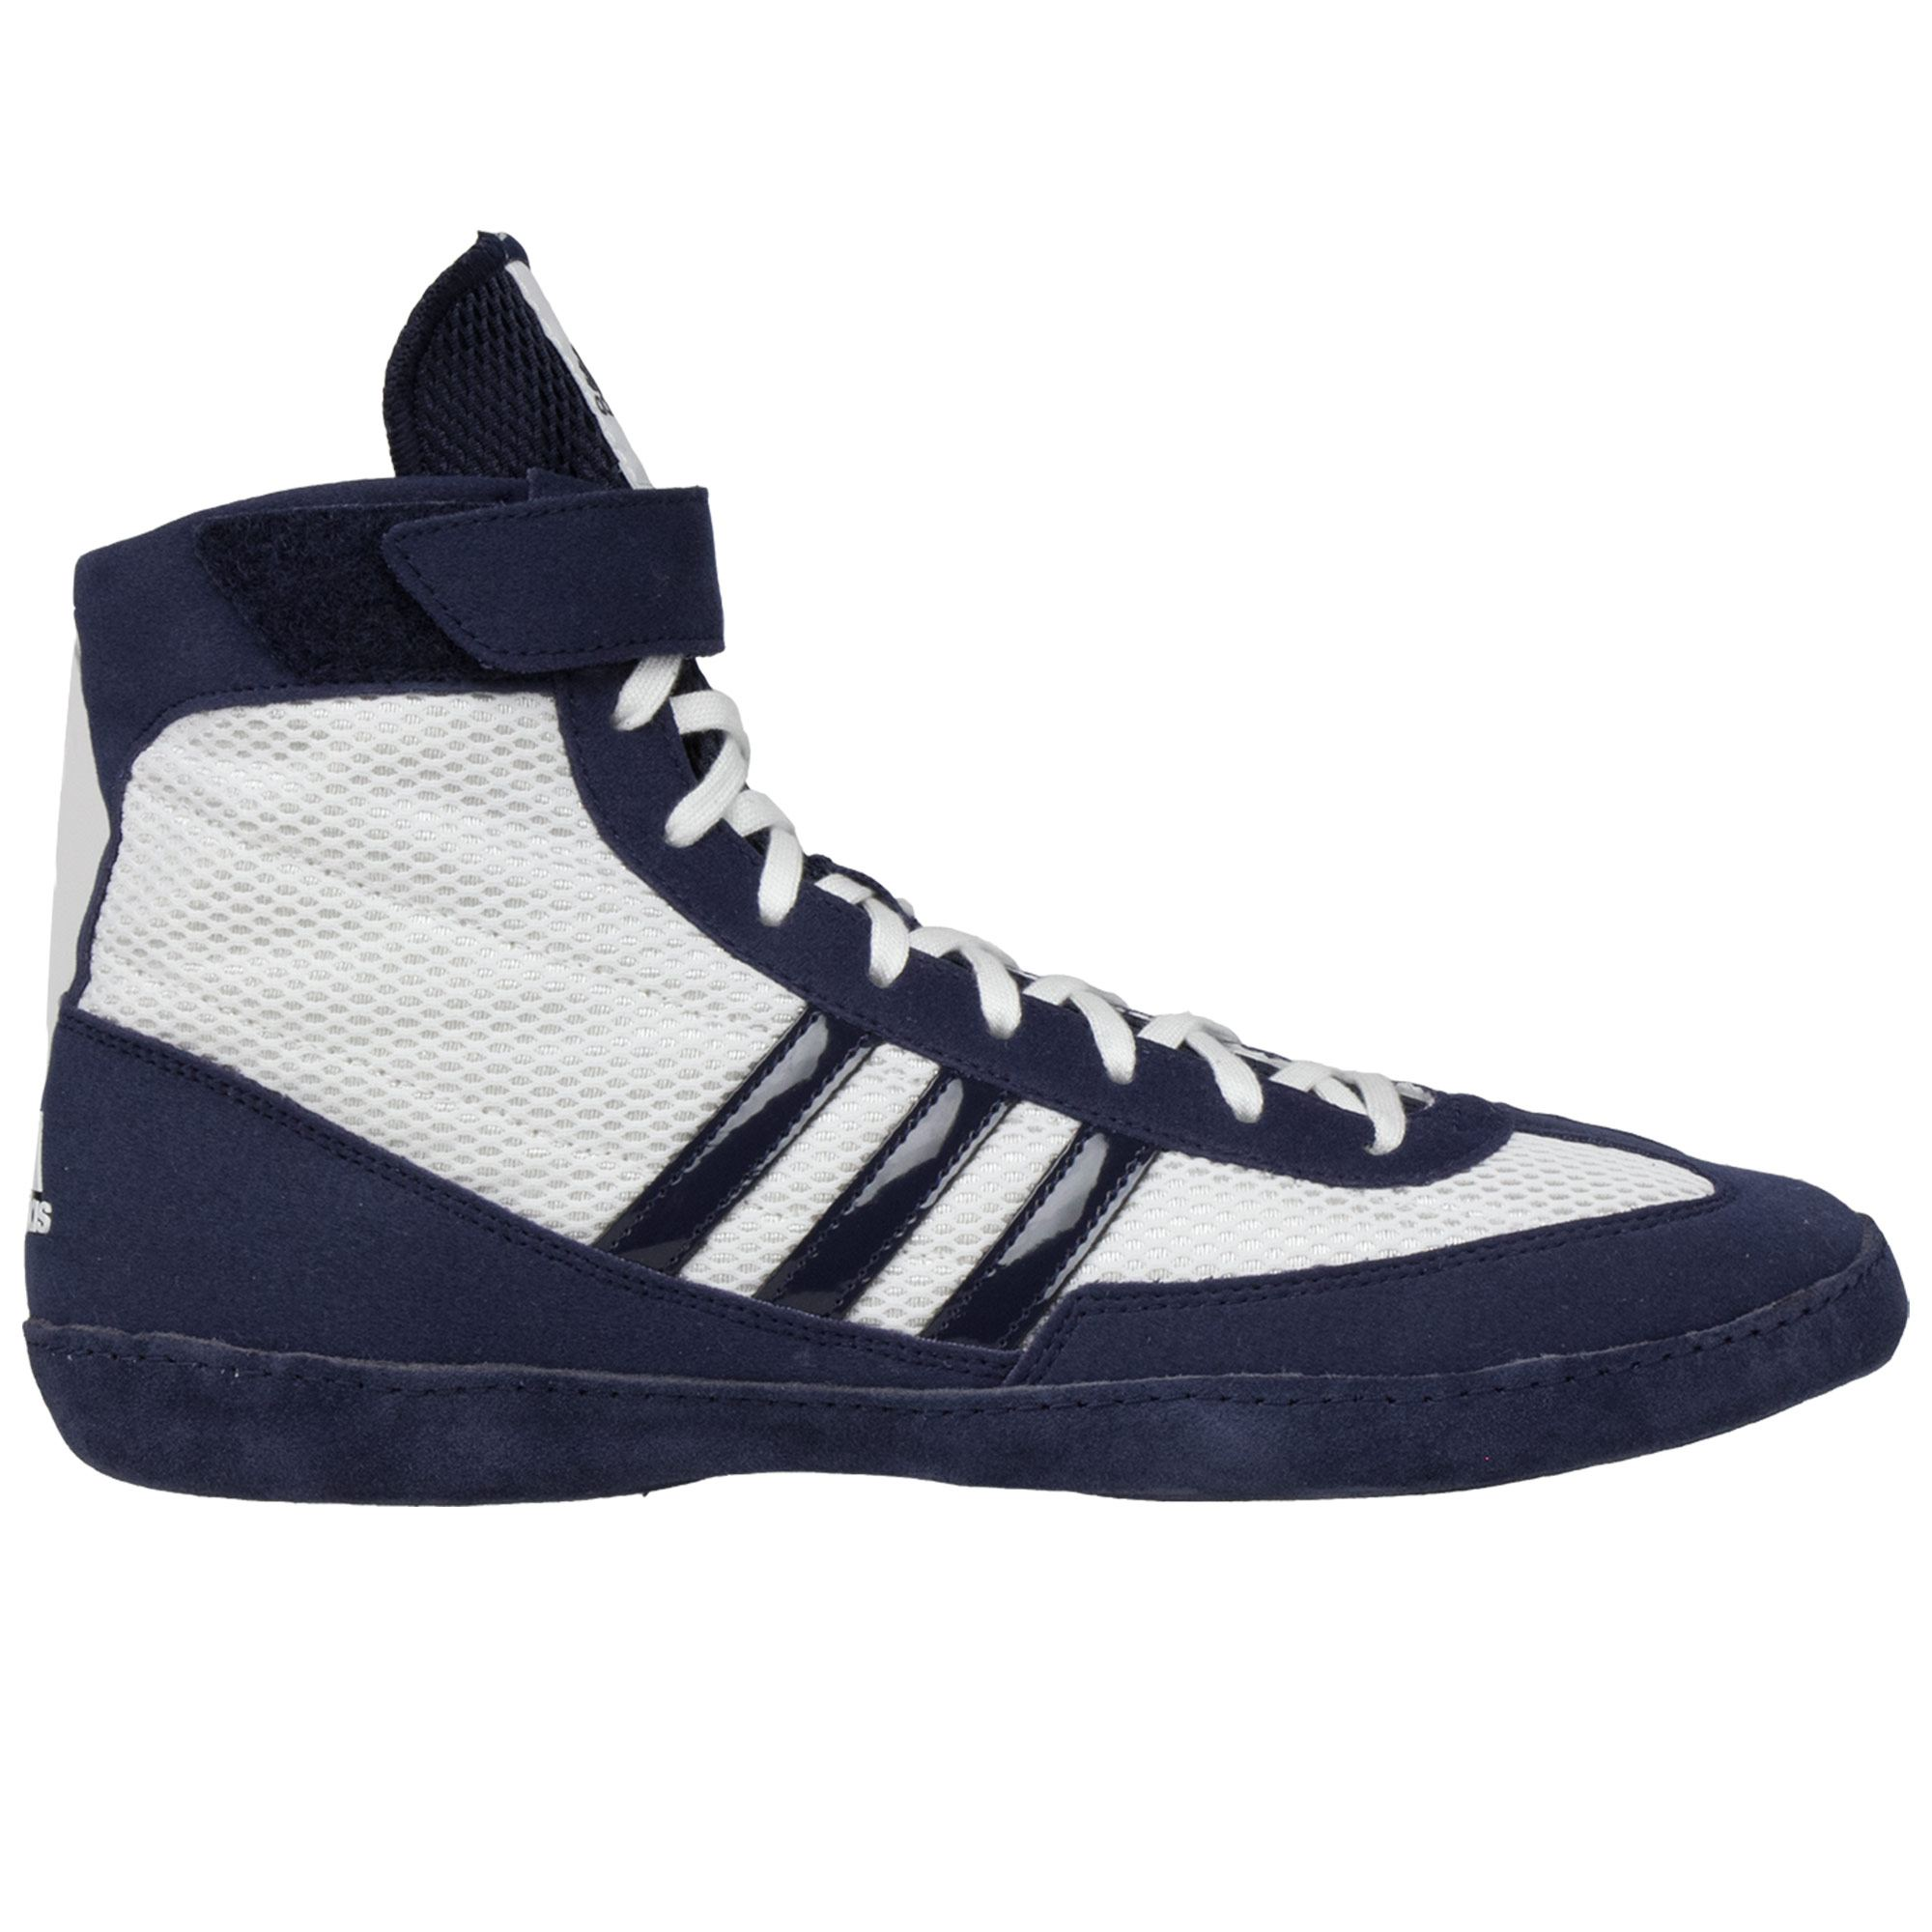 hot sales 89e81 f3f75 Adidas Combat Speed 4 Wrestling Shoe - White Navy